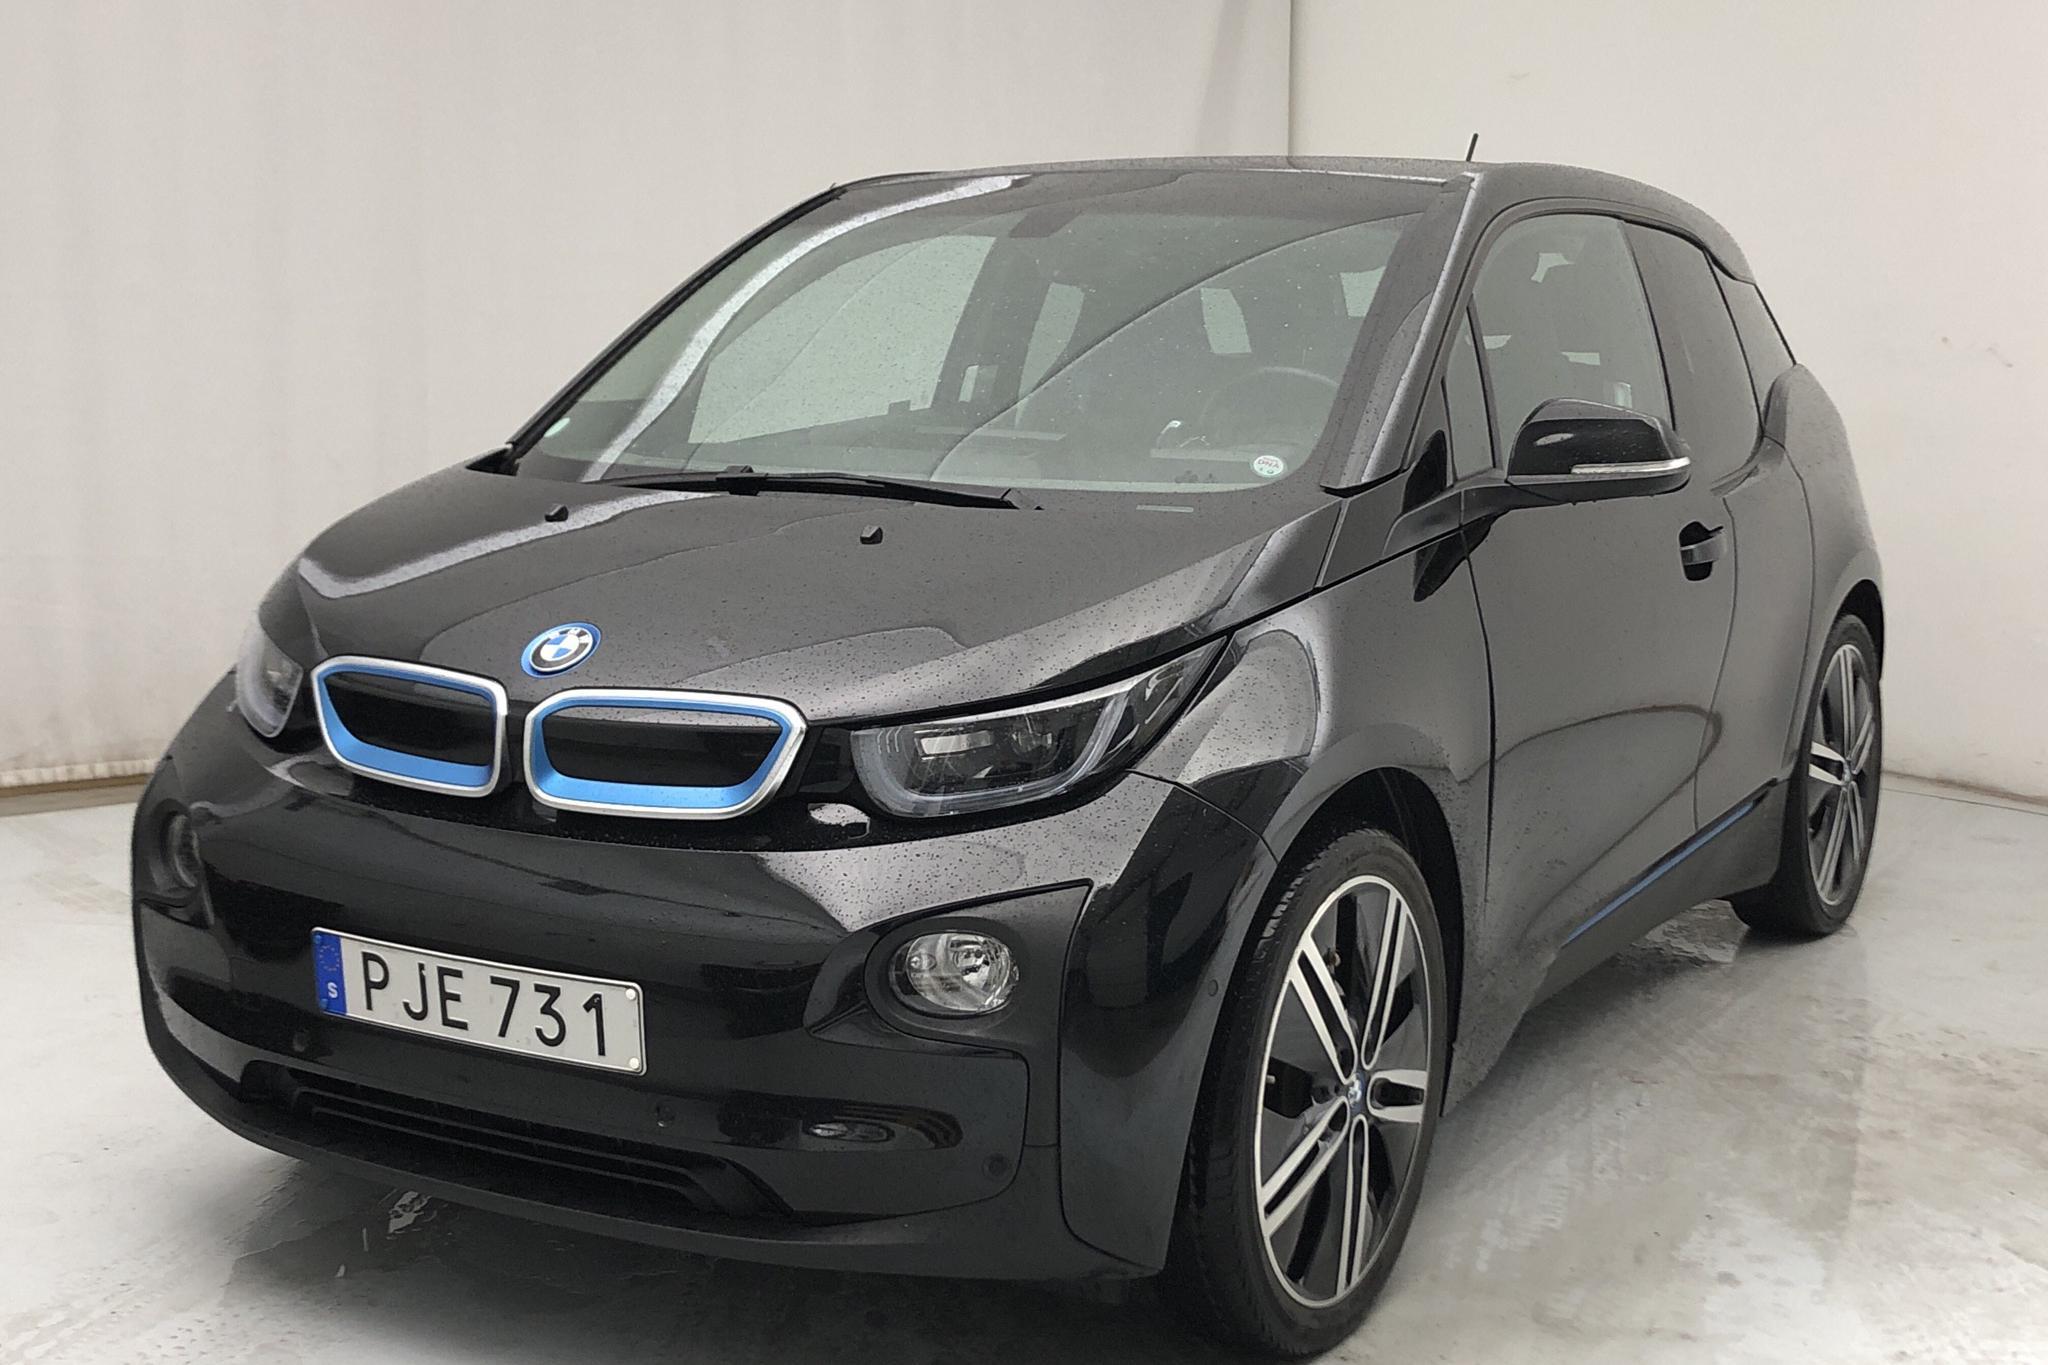 BMW i3 REX 94Ah, I01 (170hk) - 7 681 mil - Automat - svart - 2017